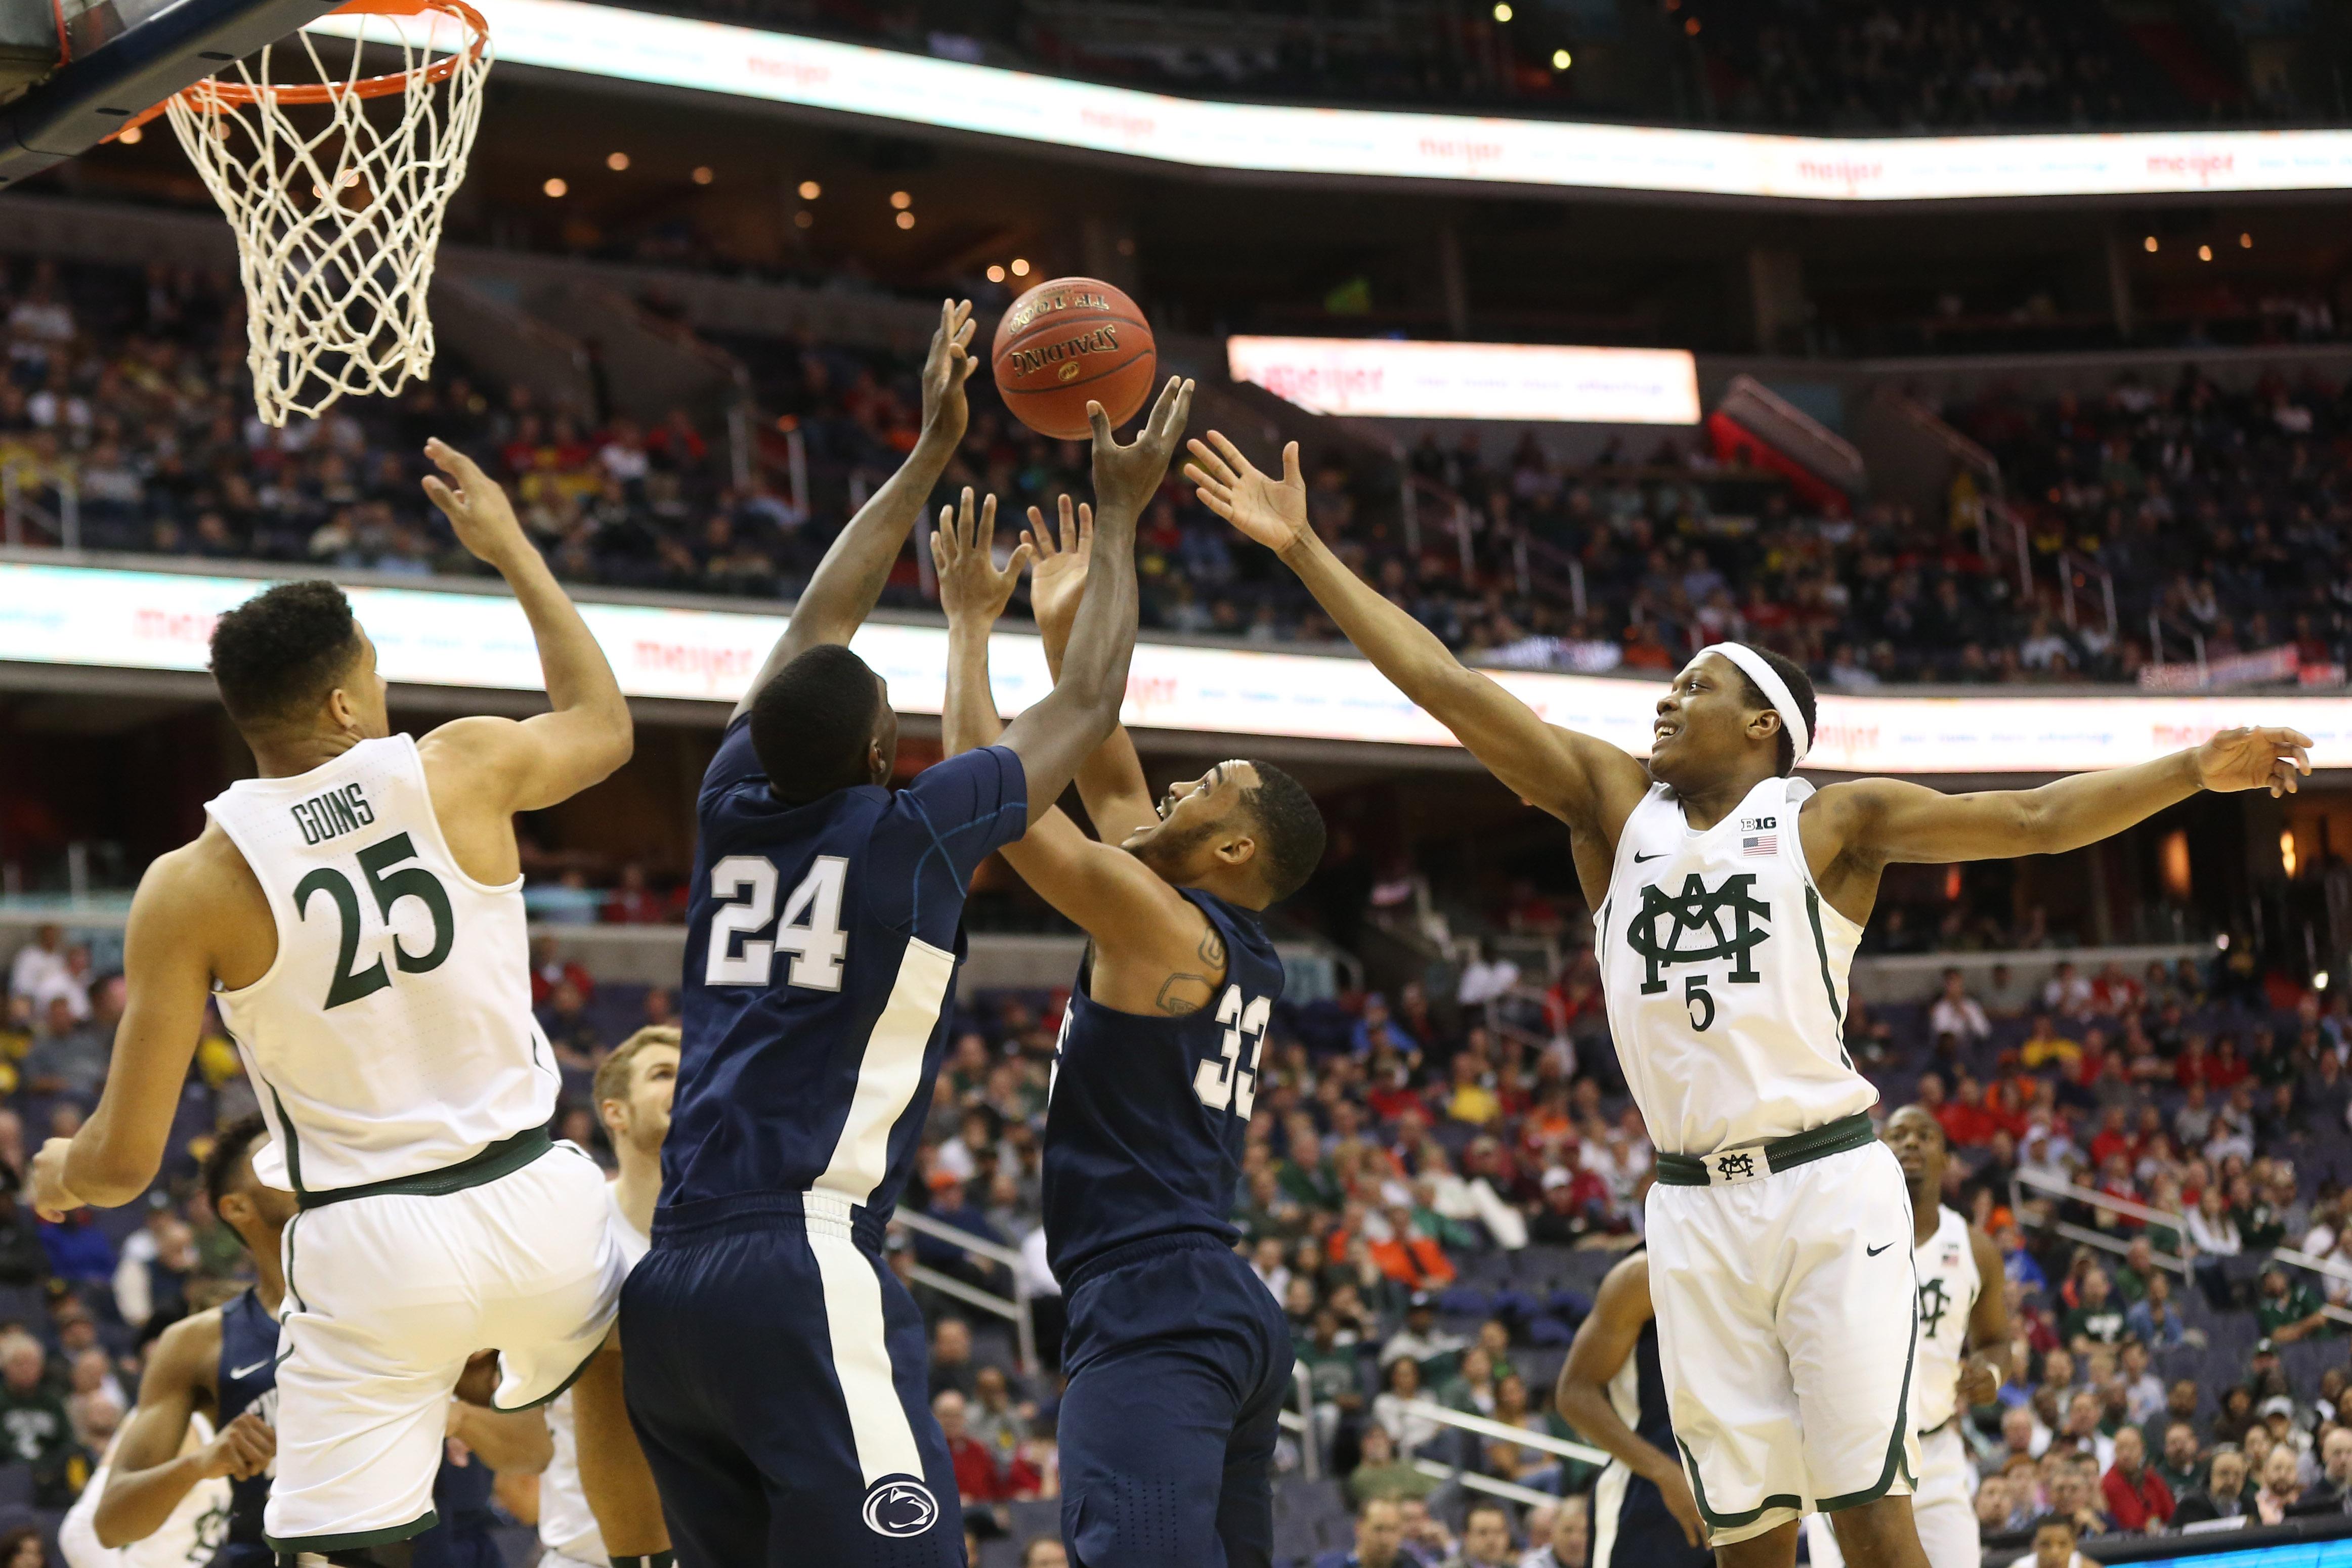 9927905-ncaa-basketball-big-ten-conference-tournament-michigan-state-vs-penn-state